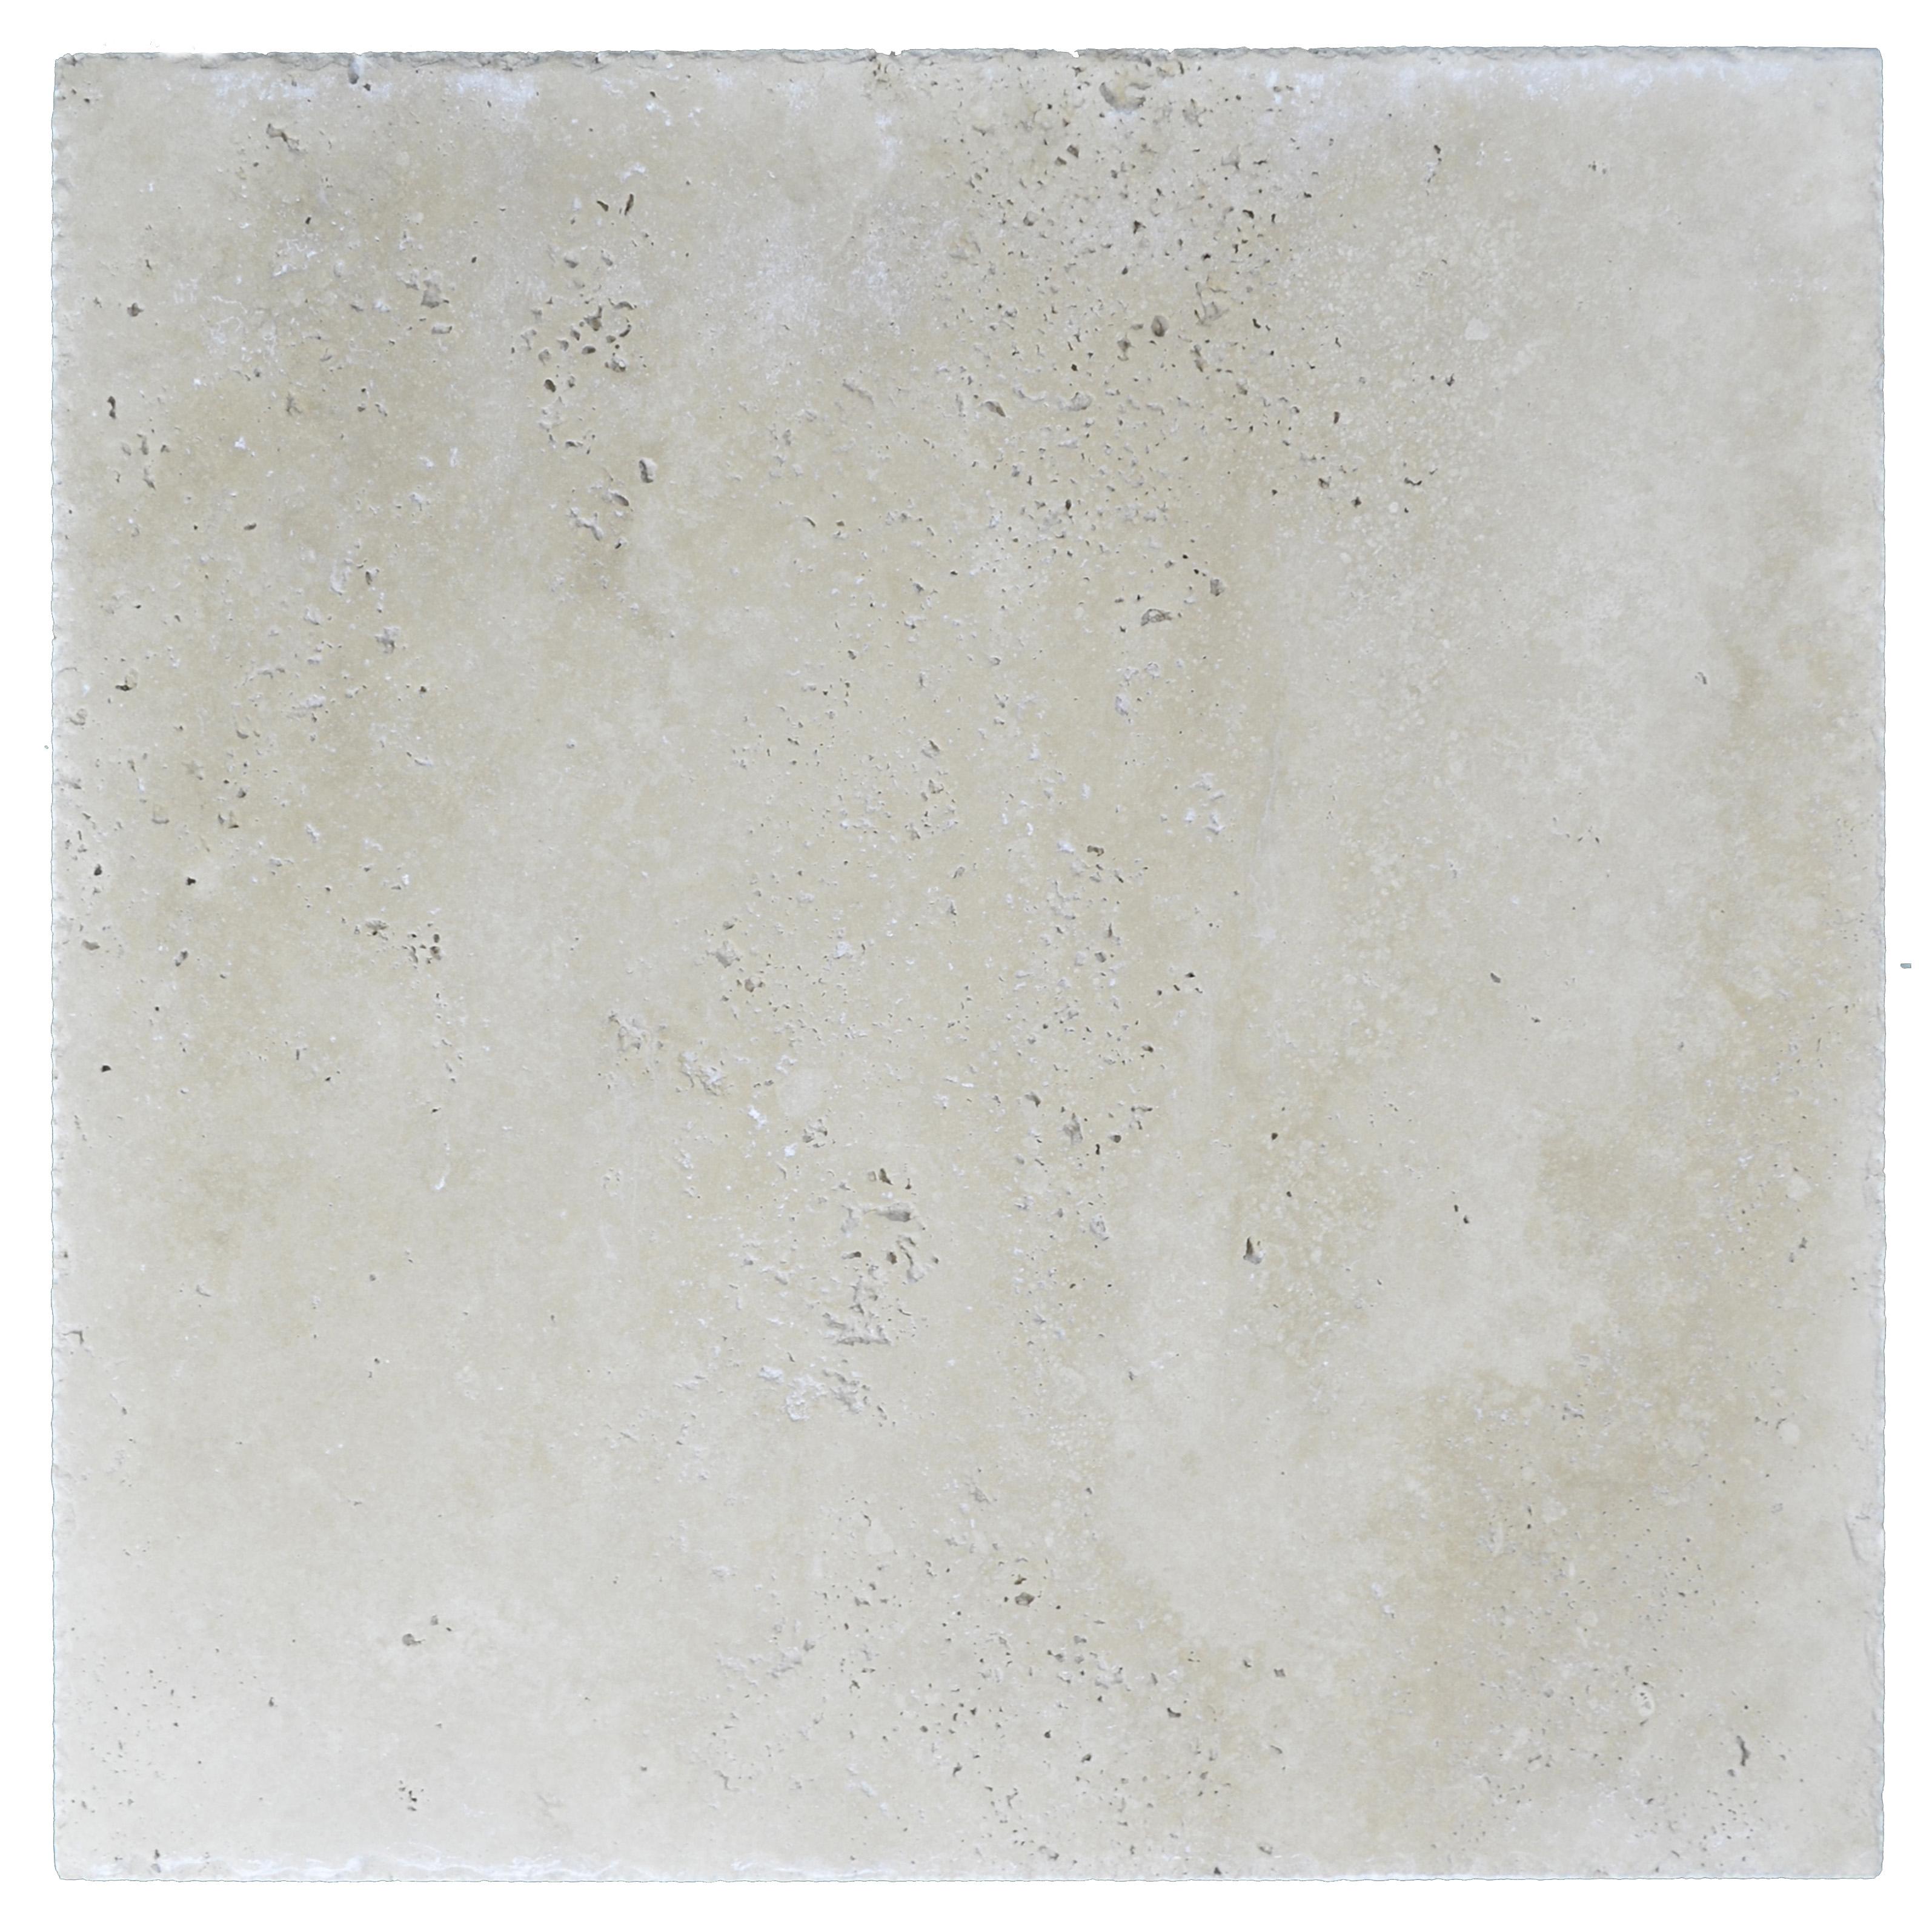 Super Light Brushed Chiseled Travertine Tiles 18x18 -Travertine sales-Atantic Stone Source